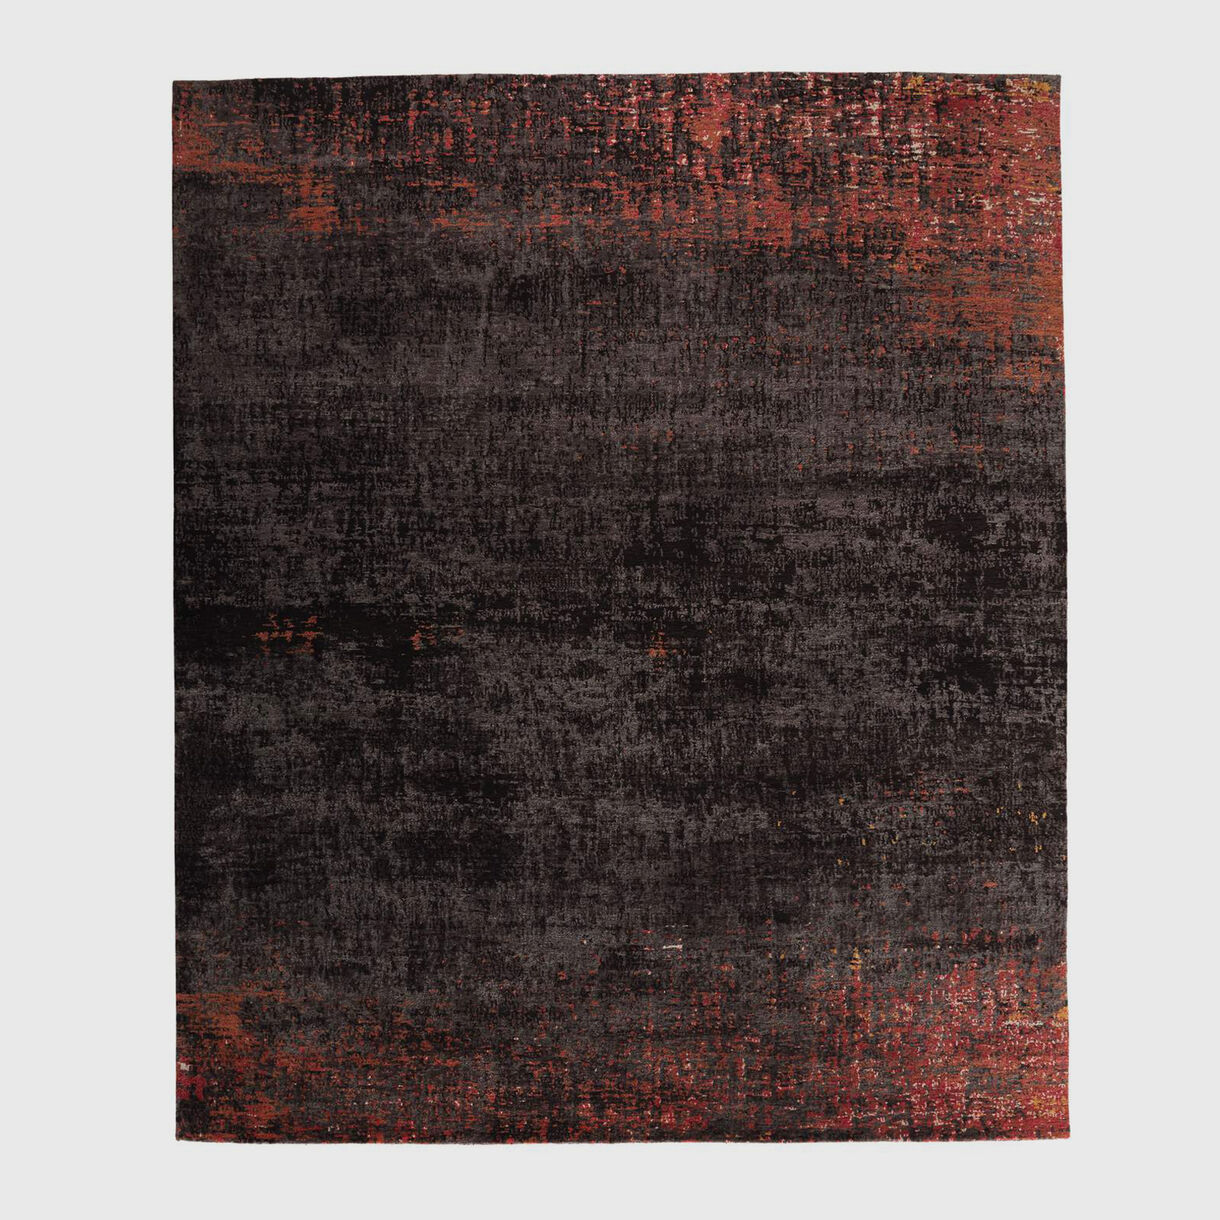 Legends of Carpets, Safara